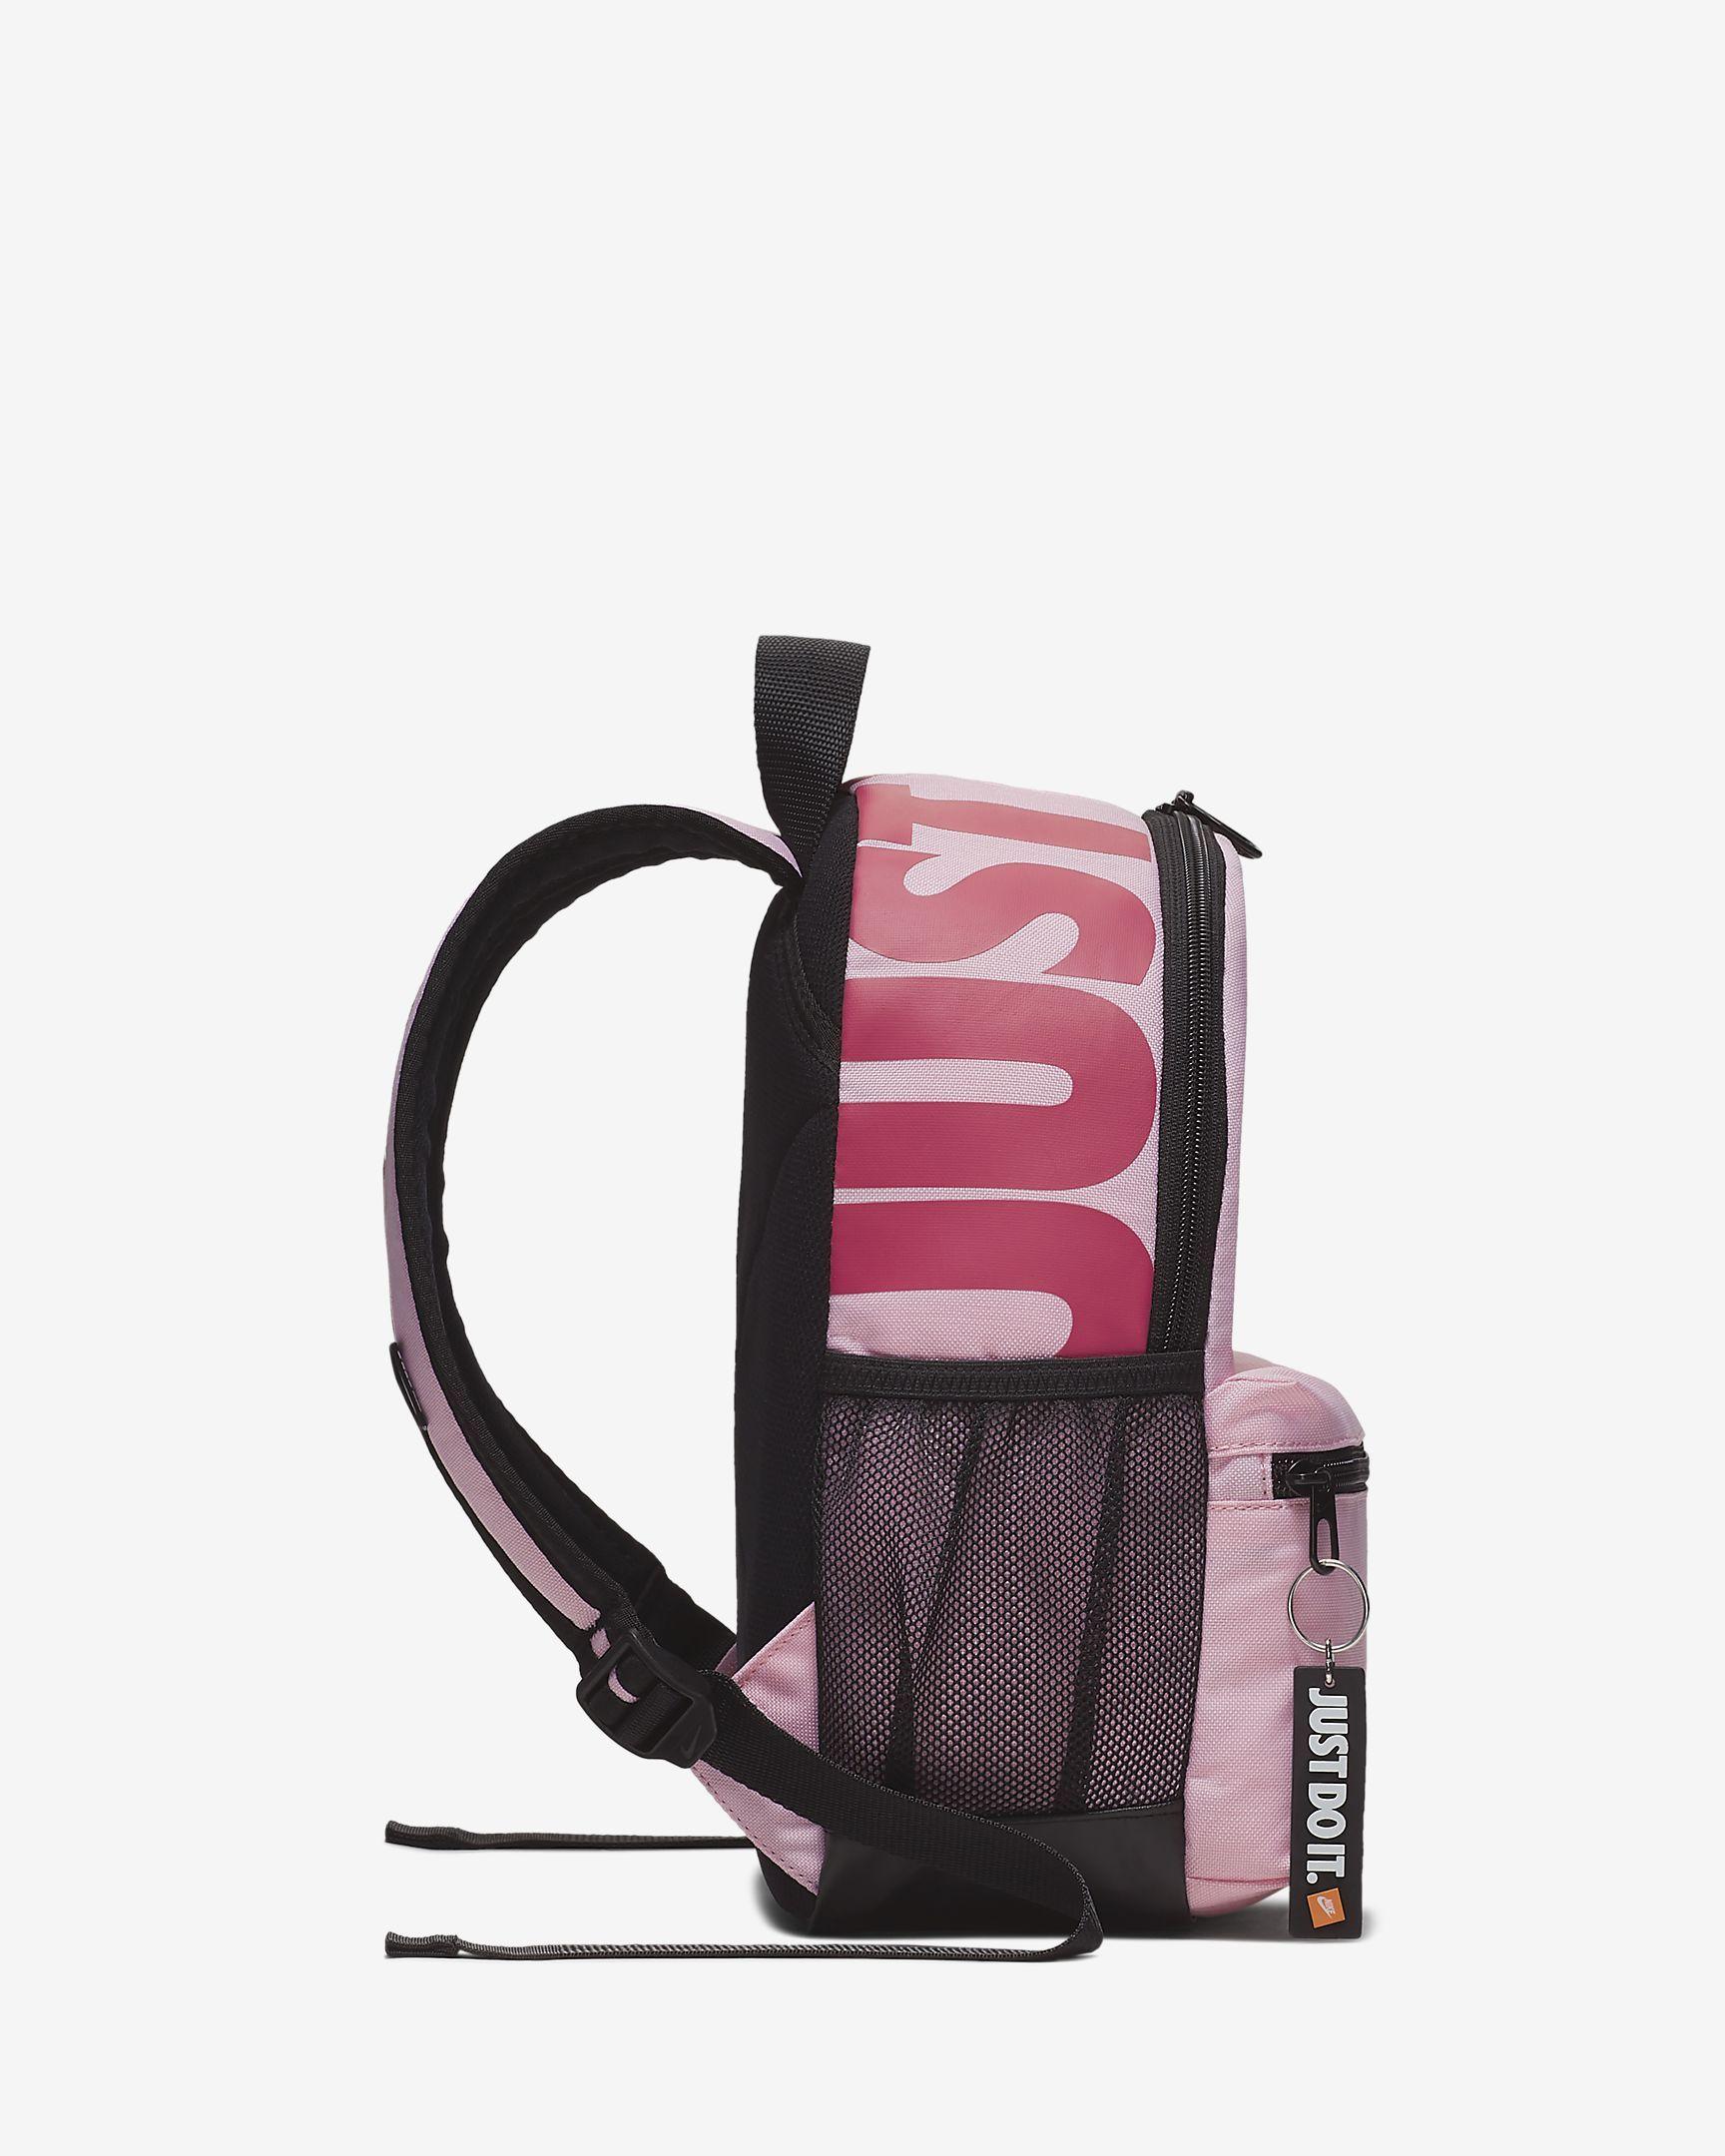 ace4471aa9 Brasilia Just Do It Kids  Backpack (Mini) in 2019